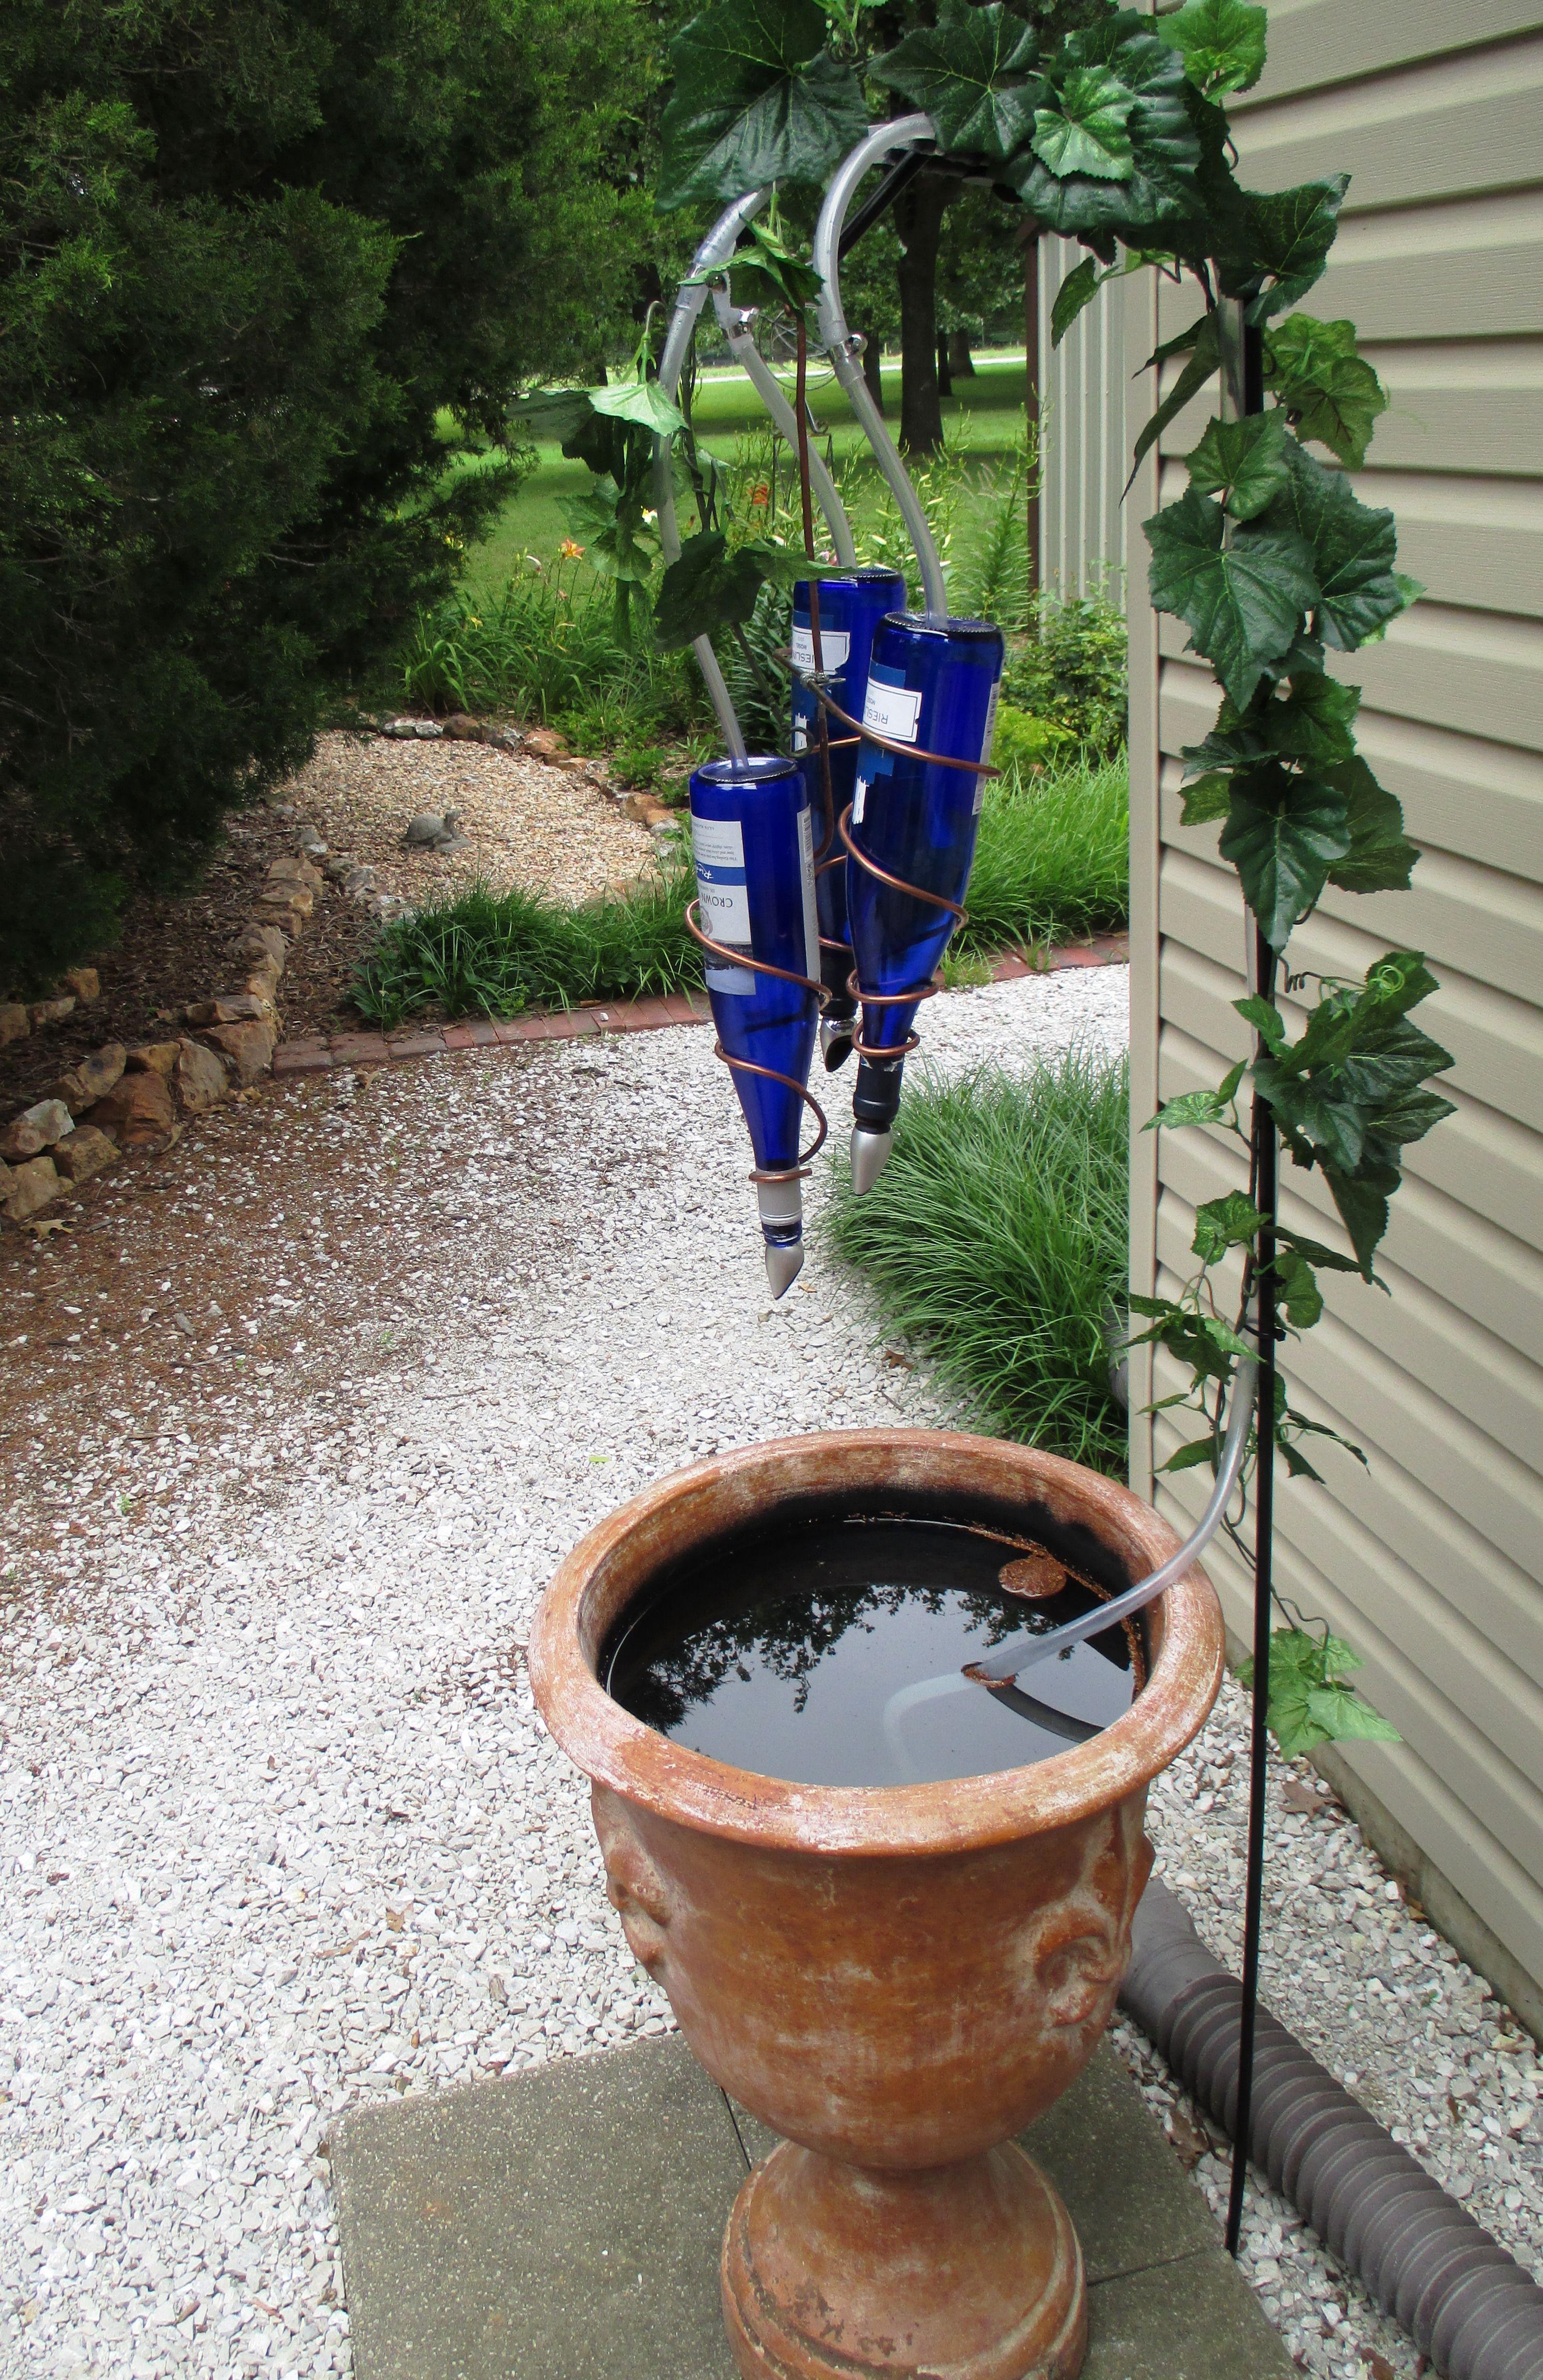 Https S Media Cache Ak0 Pinimg Com Originals 00 89 50 008950e065fedb3588754afc896e7187 Jpg Wine Bottle Fountain Diy Garden Fountains Fountains Outdoor